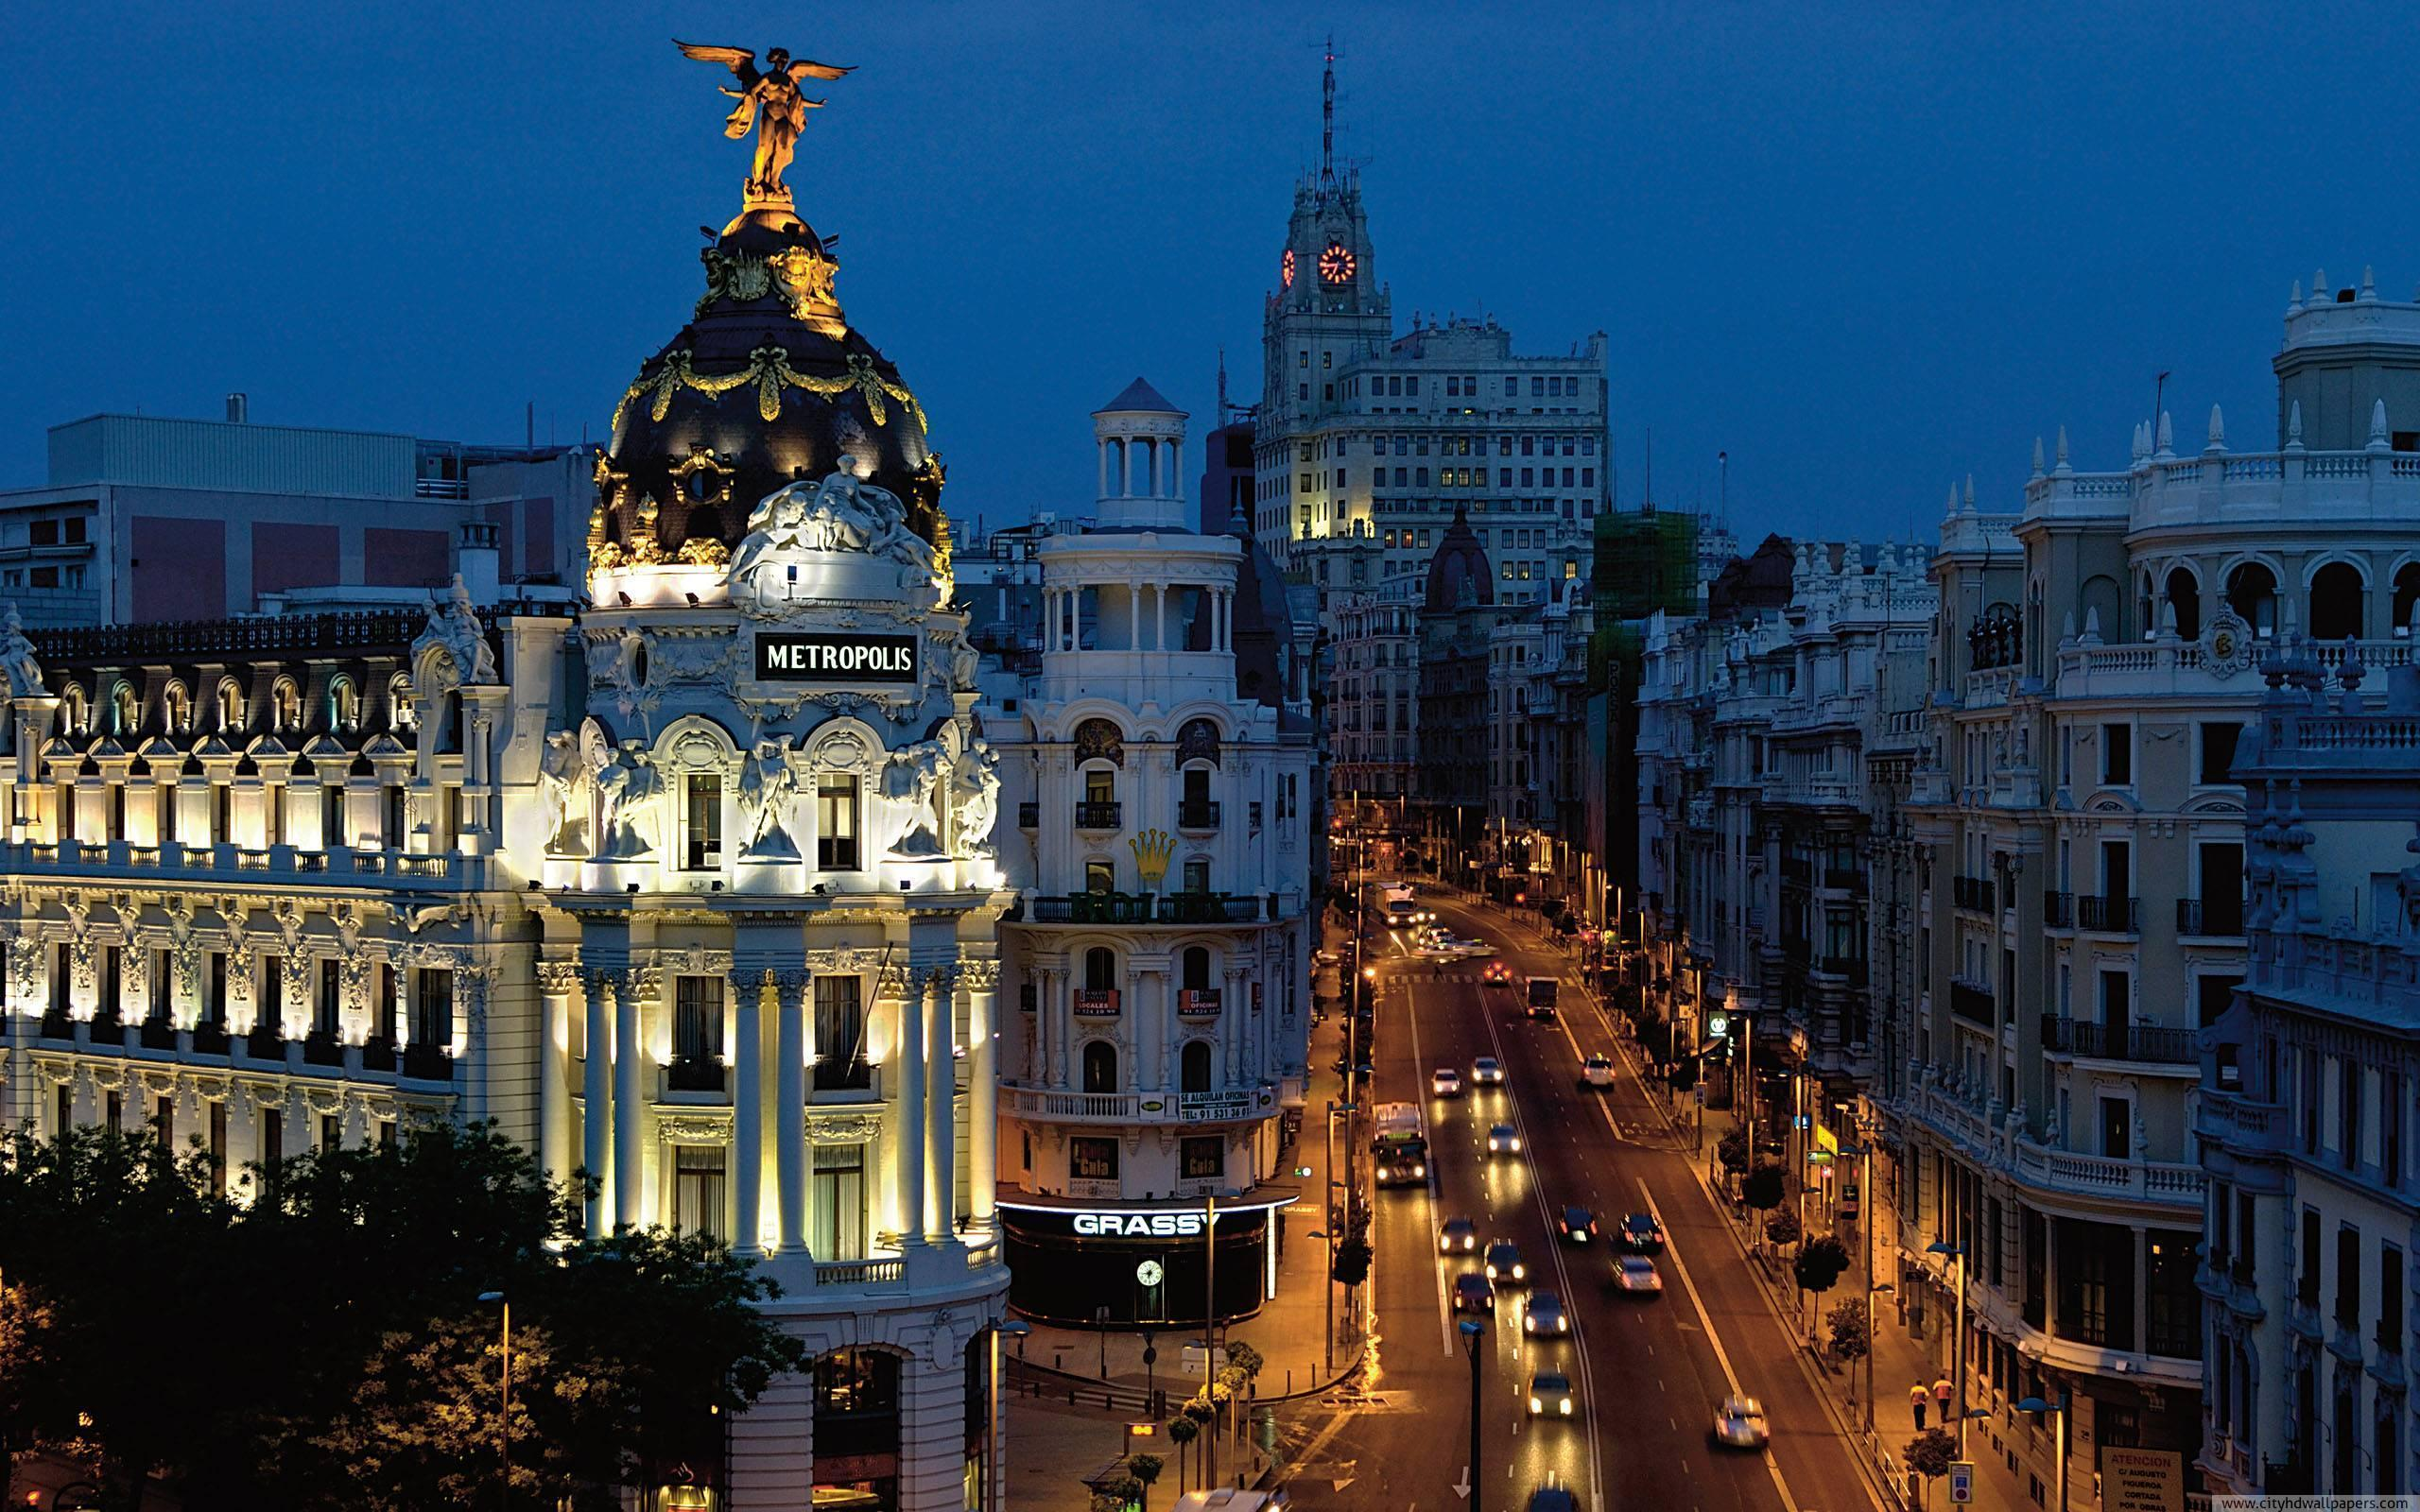 Madrid city wallpapers wallpaper cave - Madrid wallpaper ...